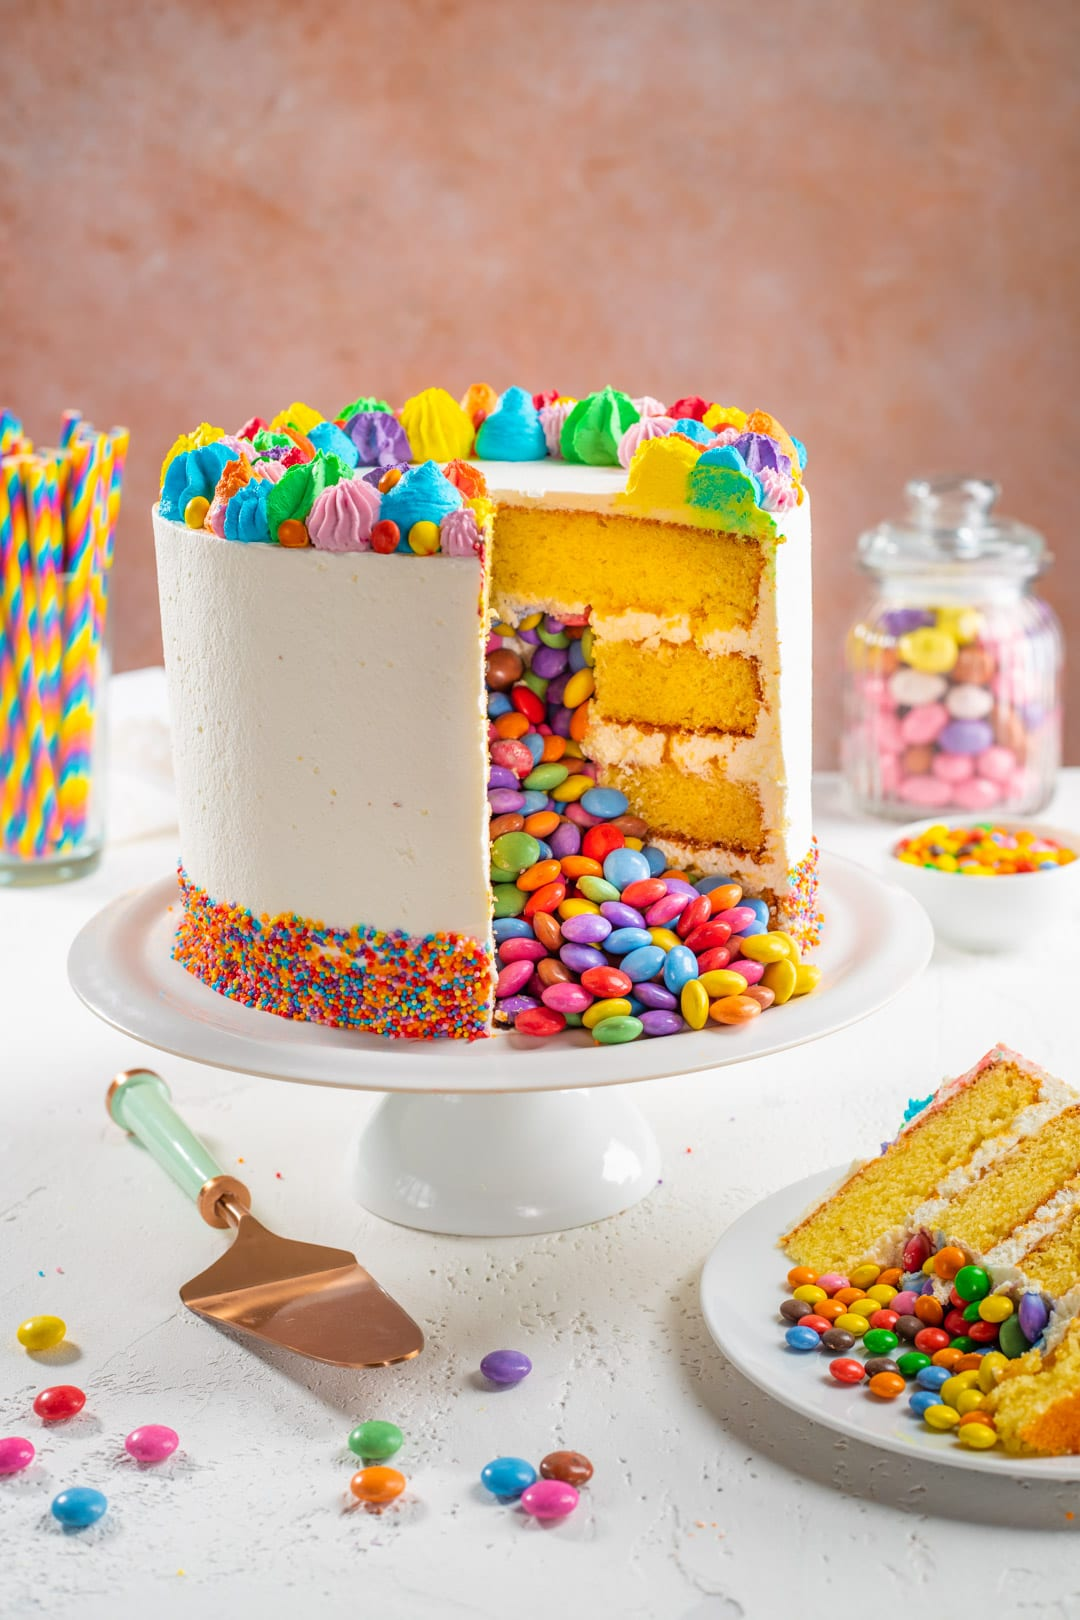 Sorprese Per Un Compleanno torta sorpresa di compleanno